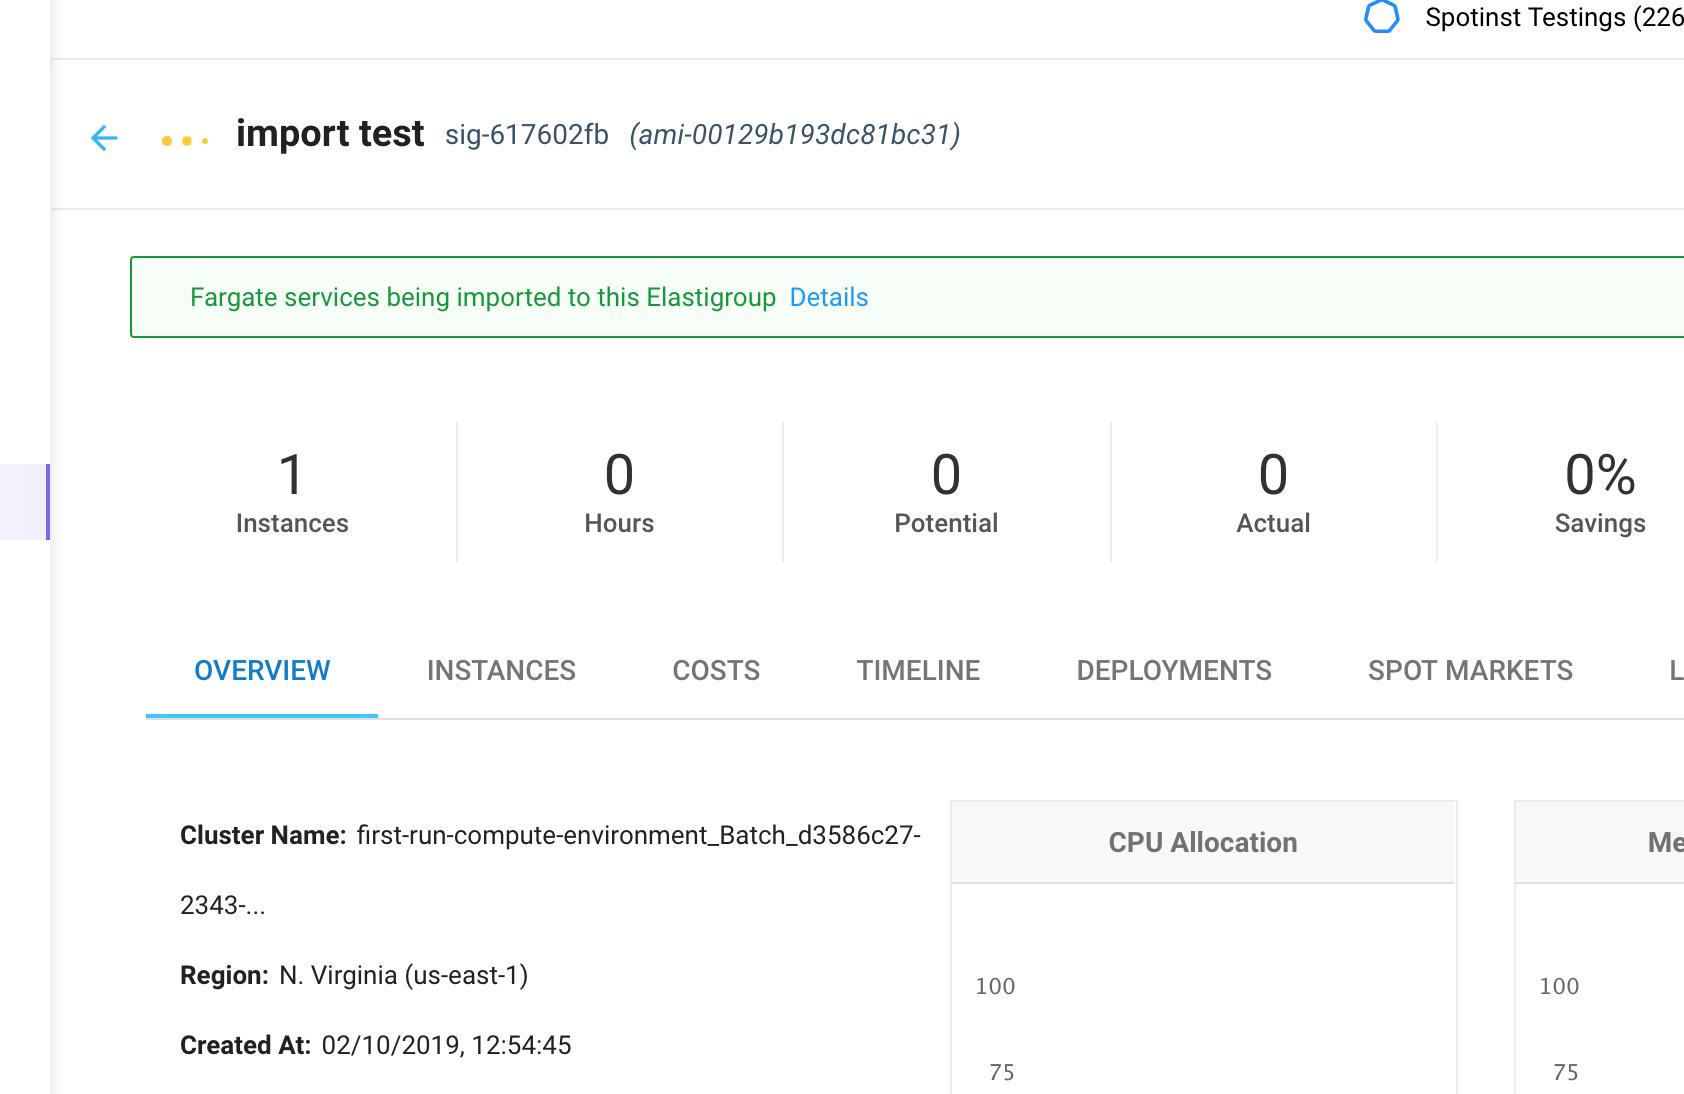 Import Fargate Services to ECS Elastigroup - Spotinst API